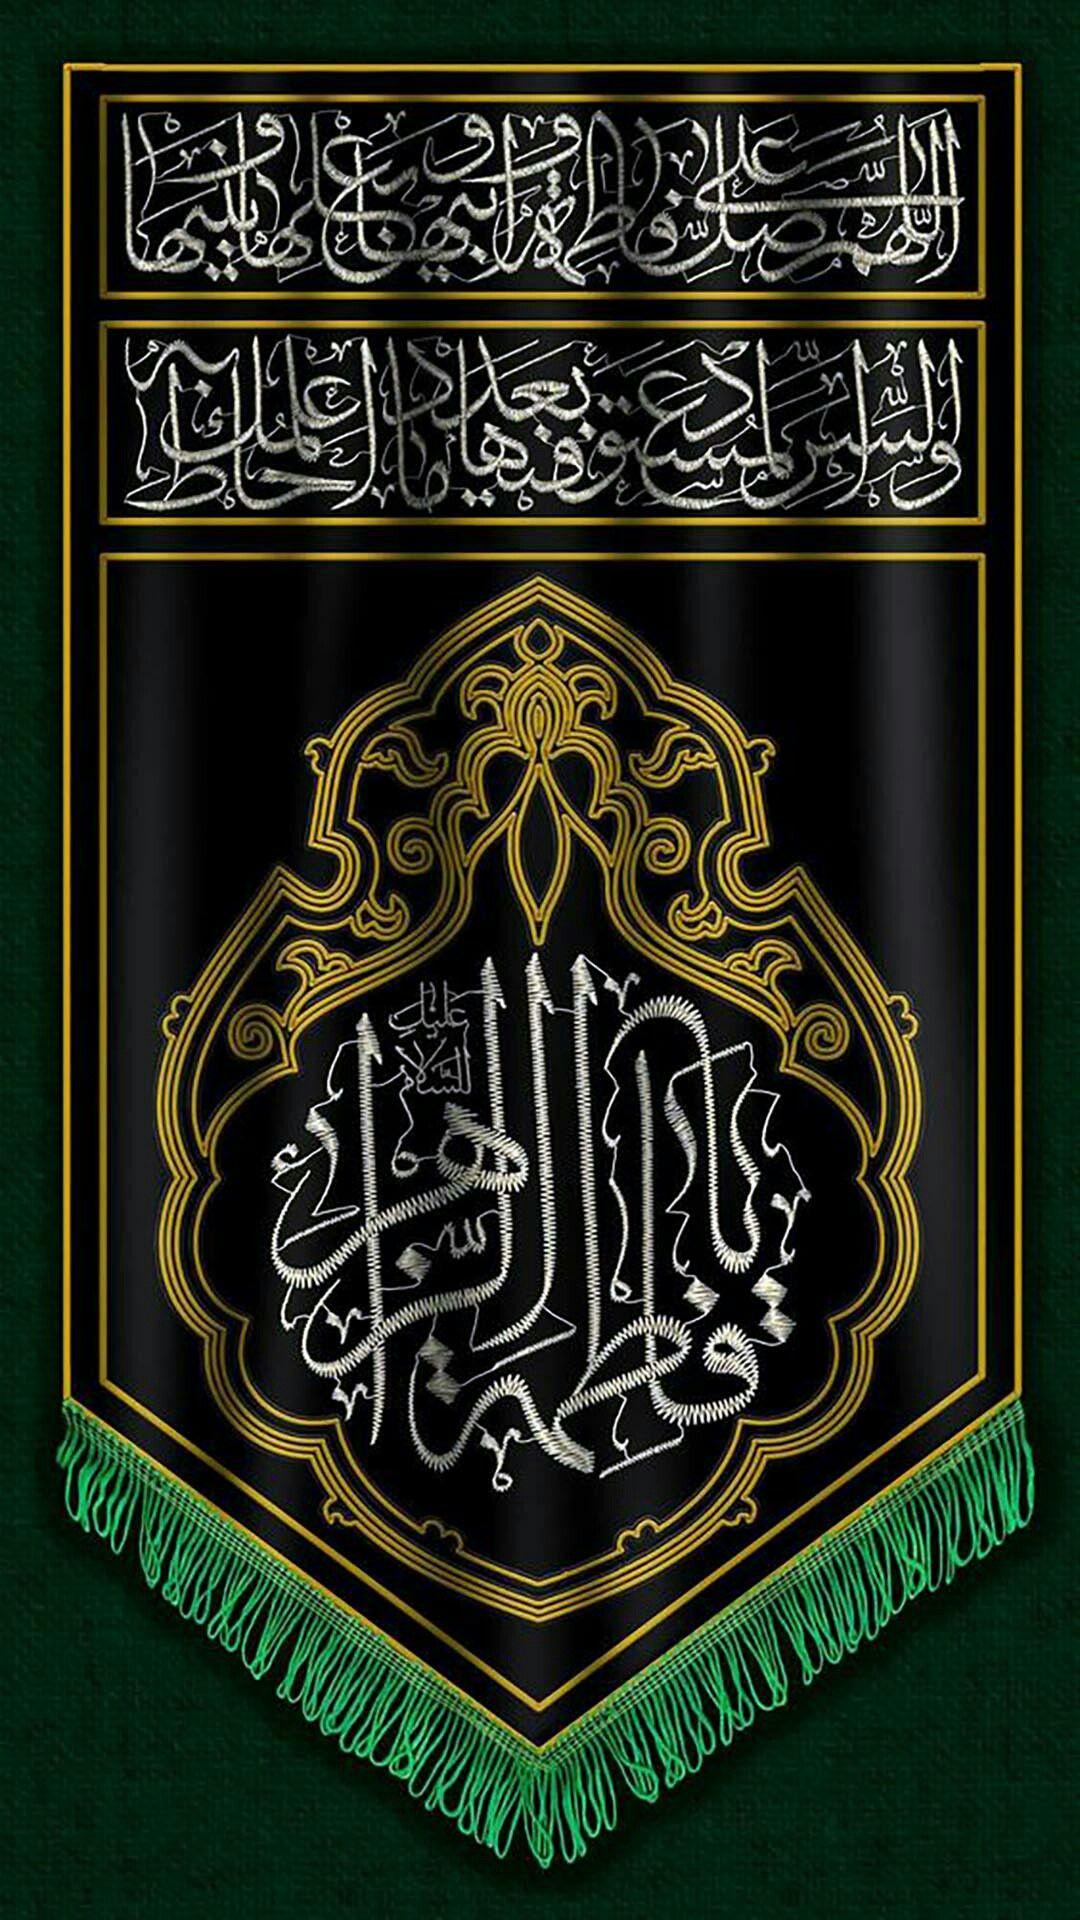 Pin Oleh Ananda Kazuki Di Kaligrafi Kaligrafi Seni Islamis Kaligrafi Islam